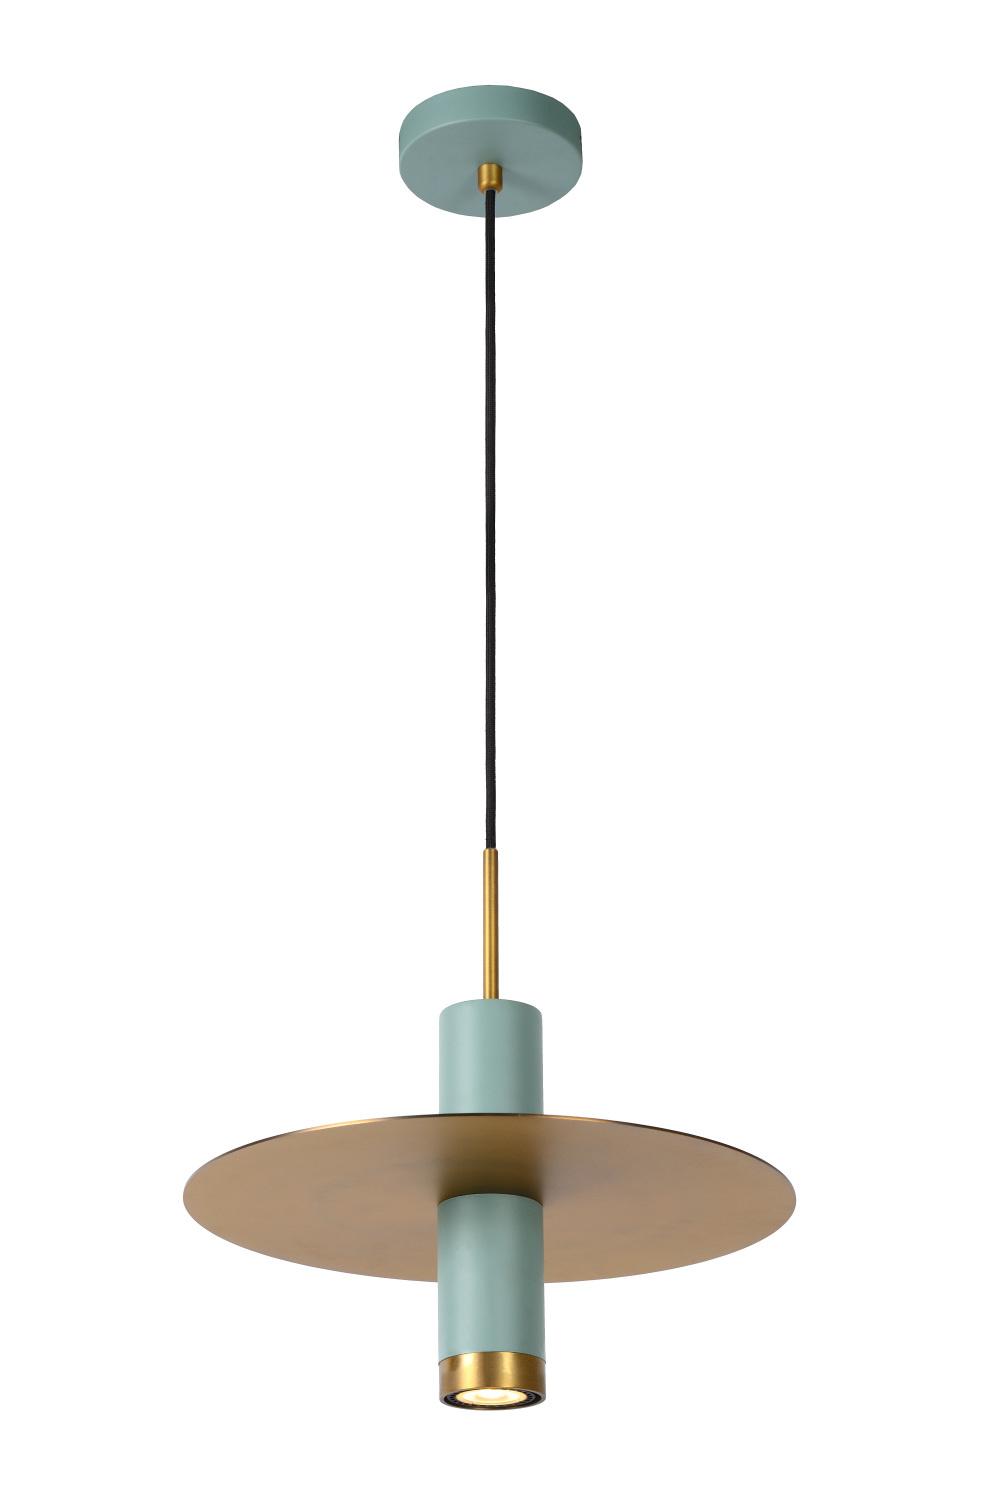 Lucide SELIN Hanglamp-Turkoo.-Ø35-1xGU10-35W-Metaal